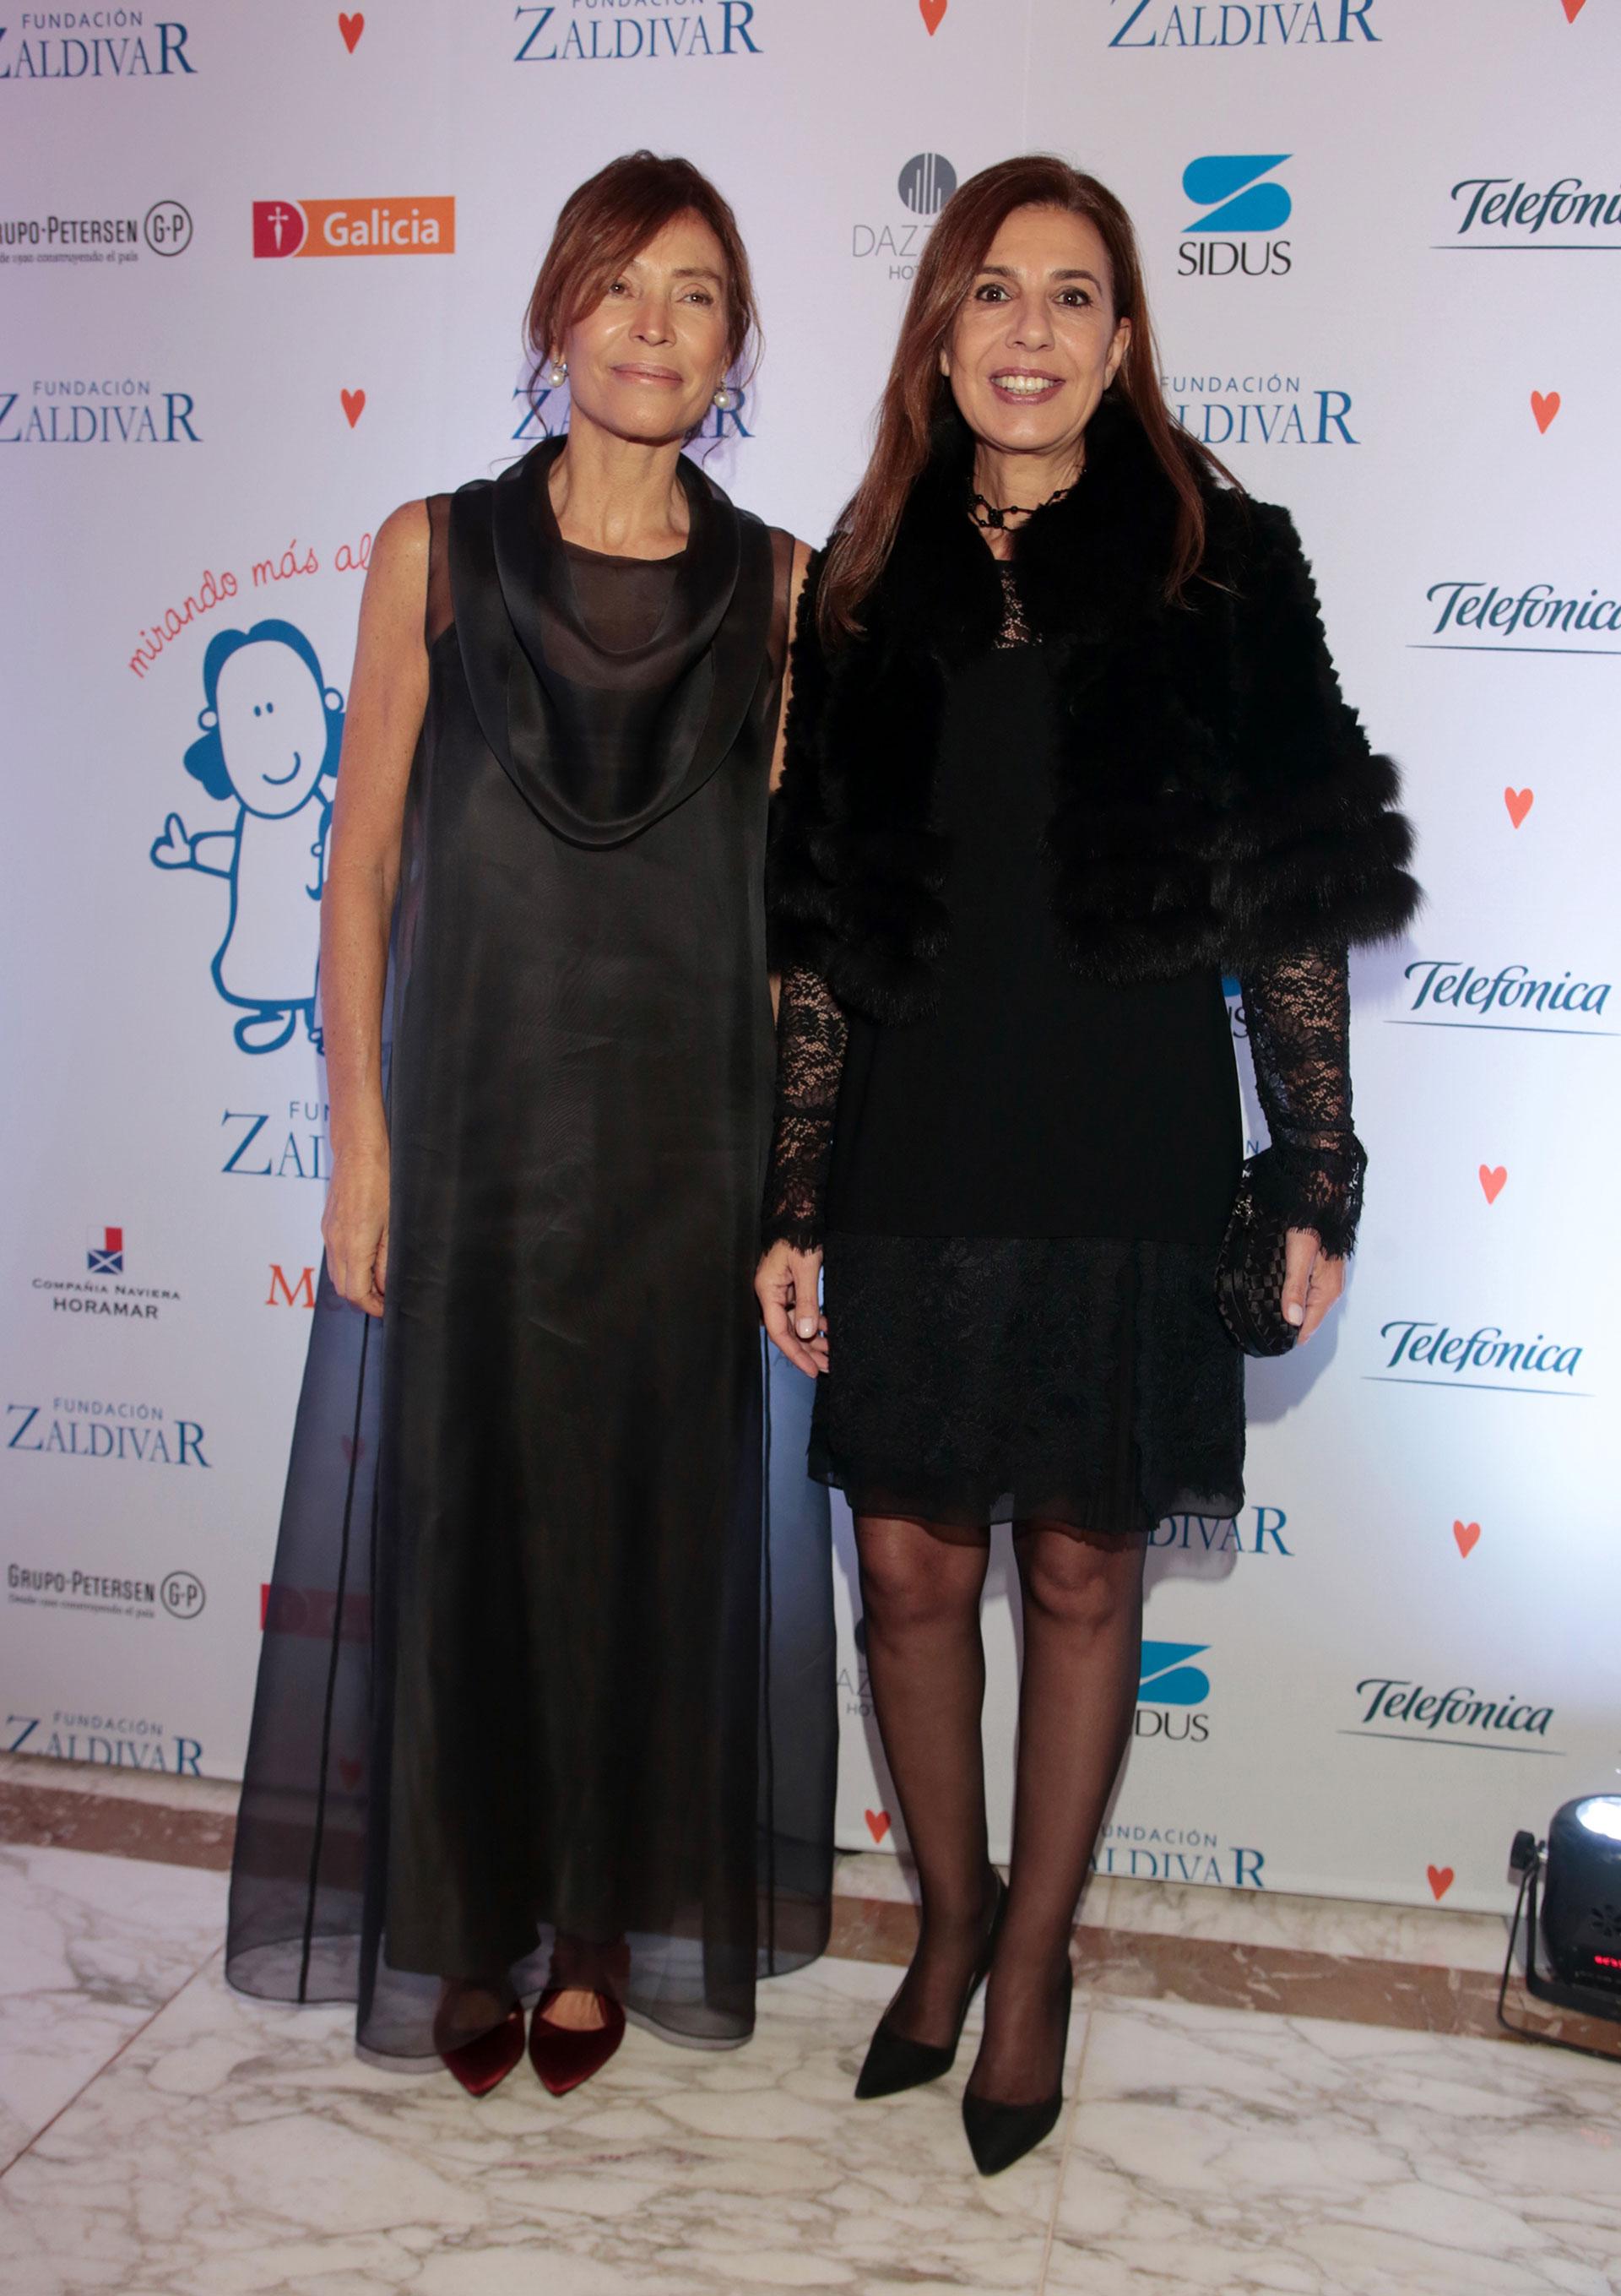 Estela Zaldivar y Zoraida Awada